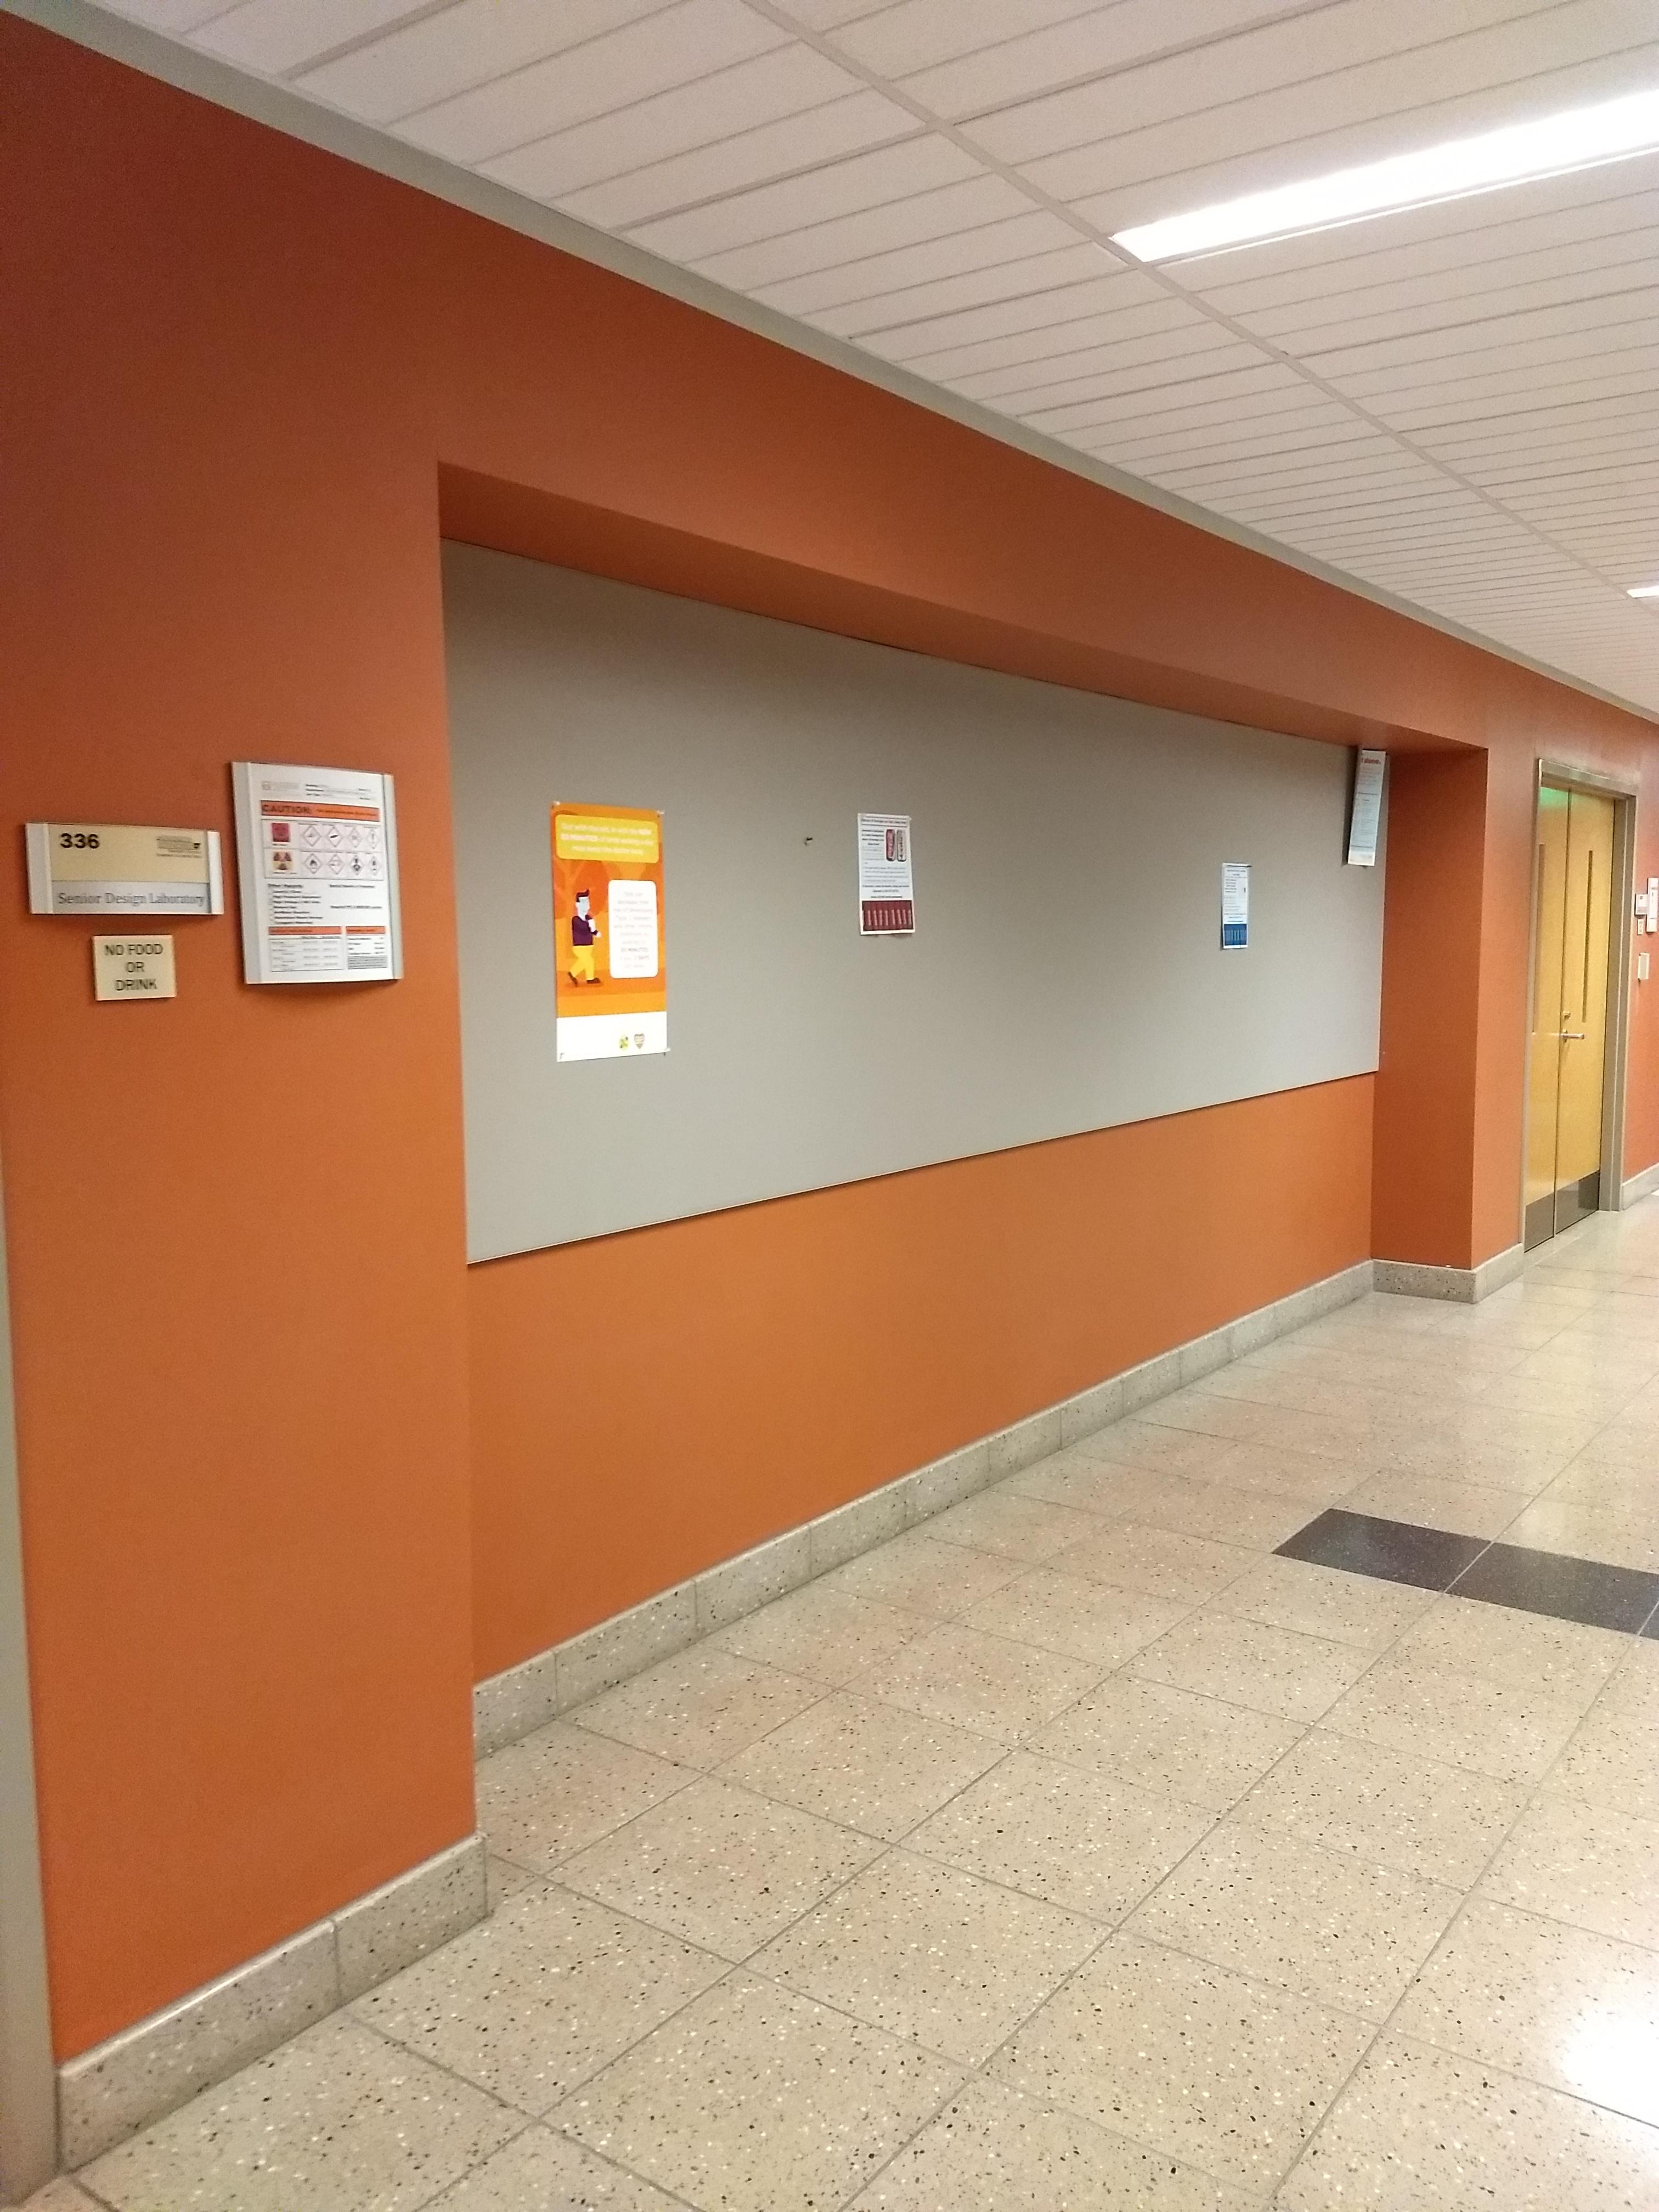 3rd floor hall by room 336